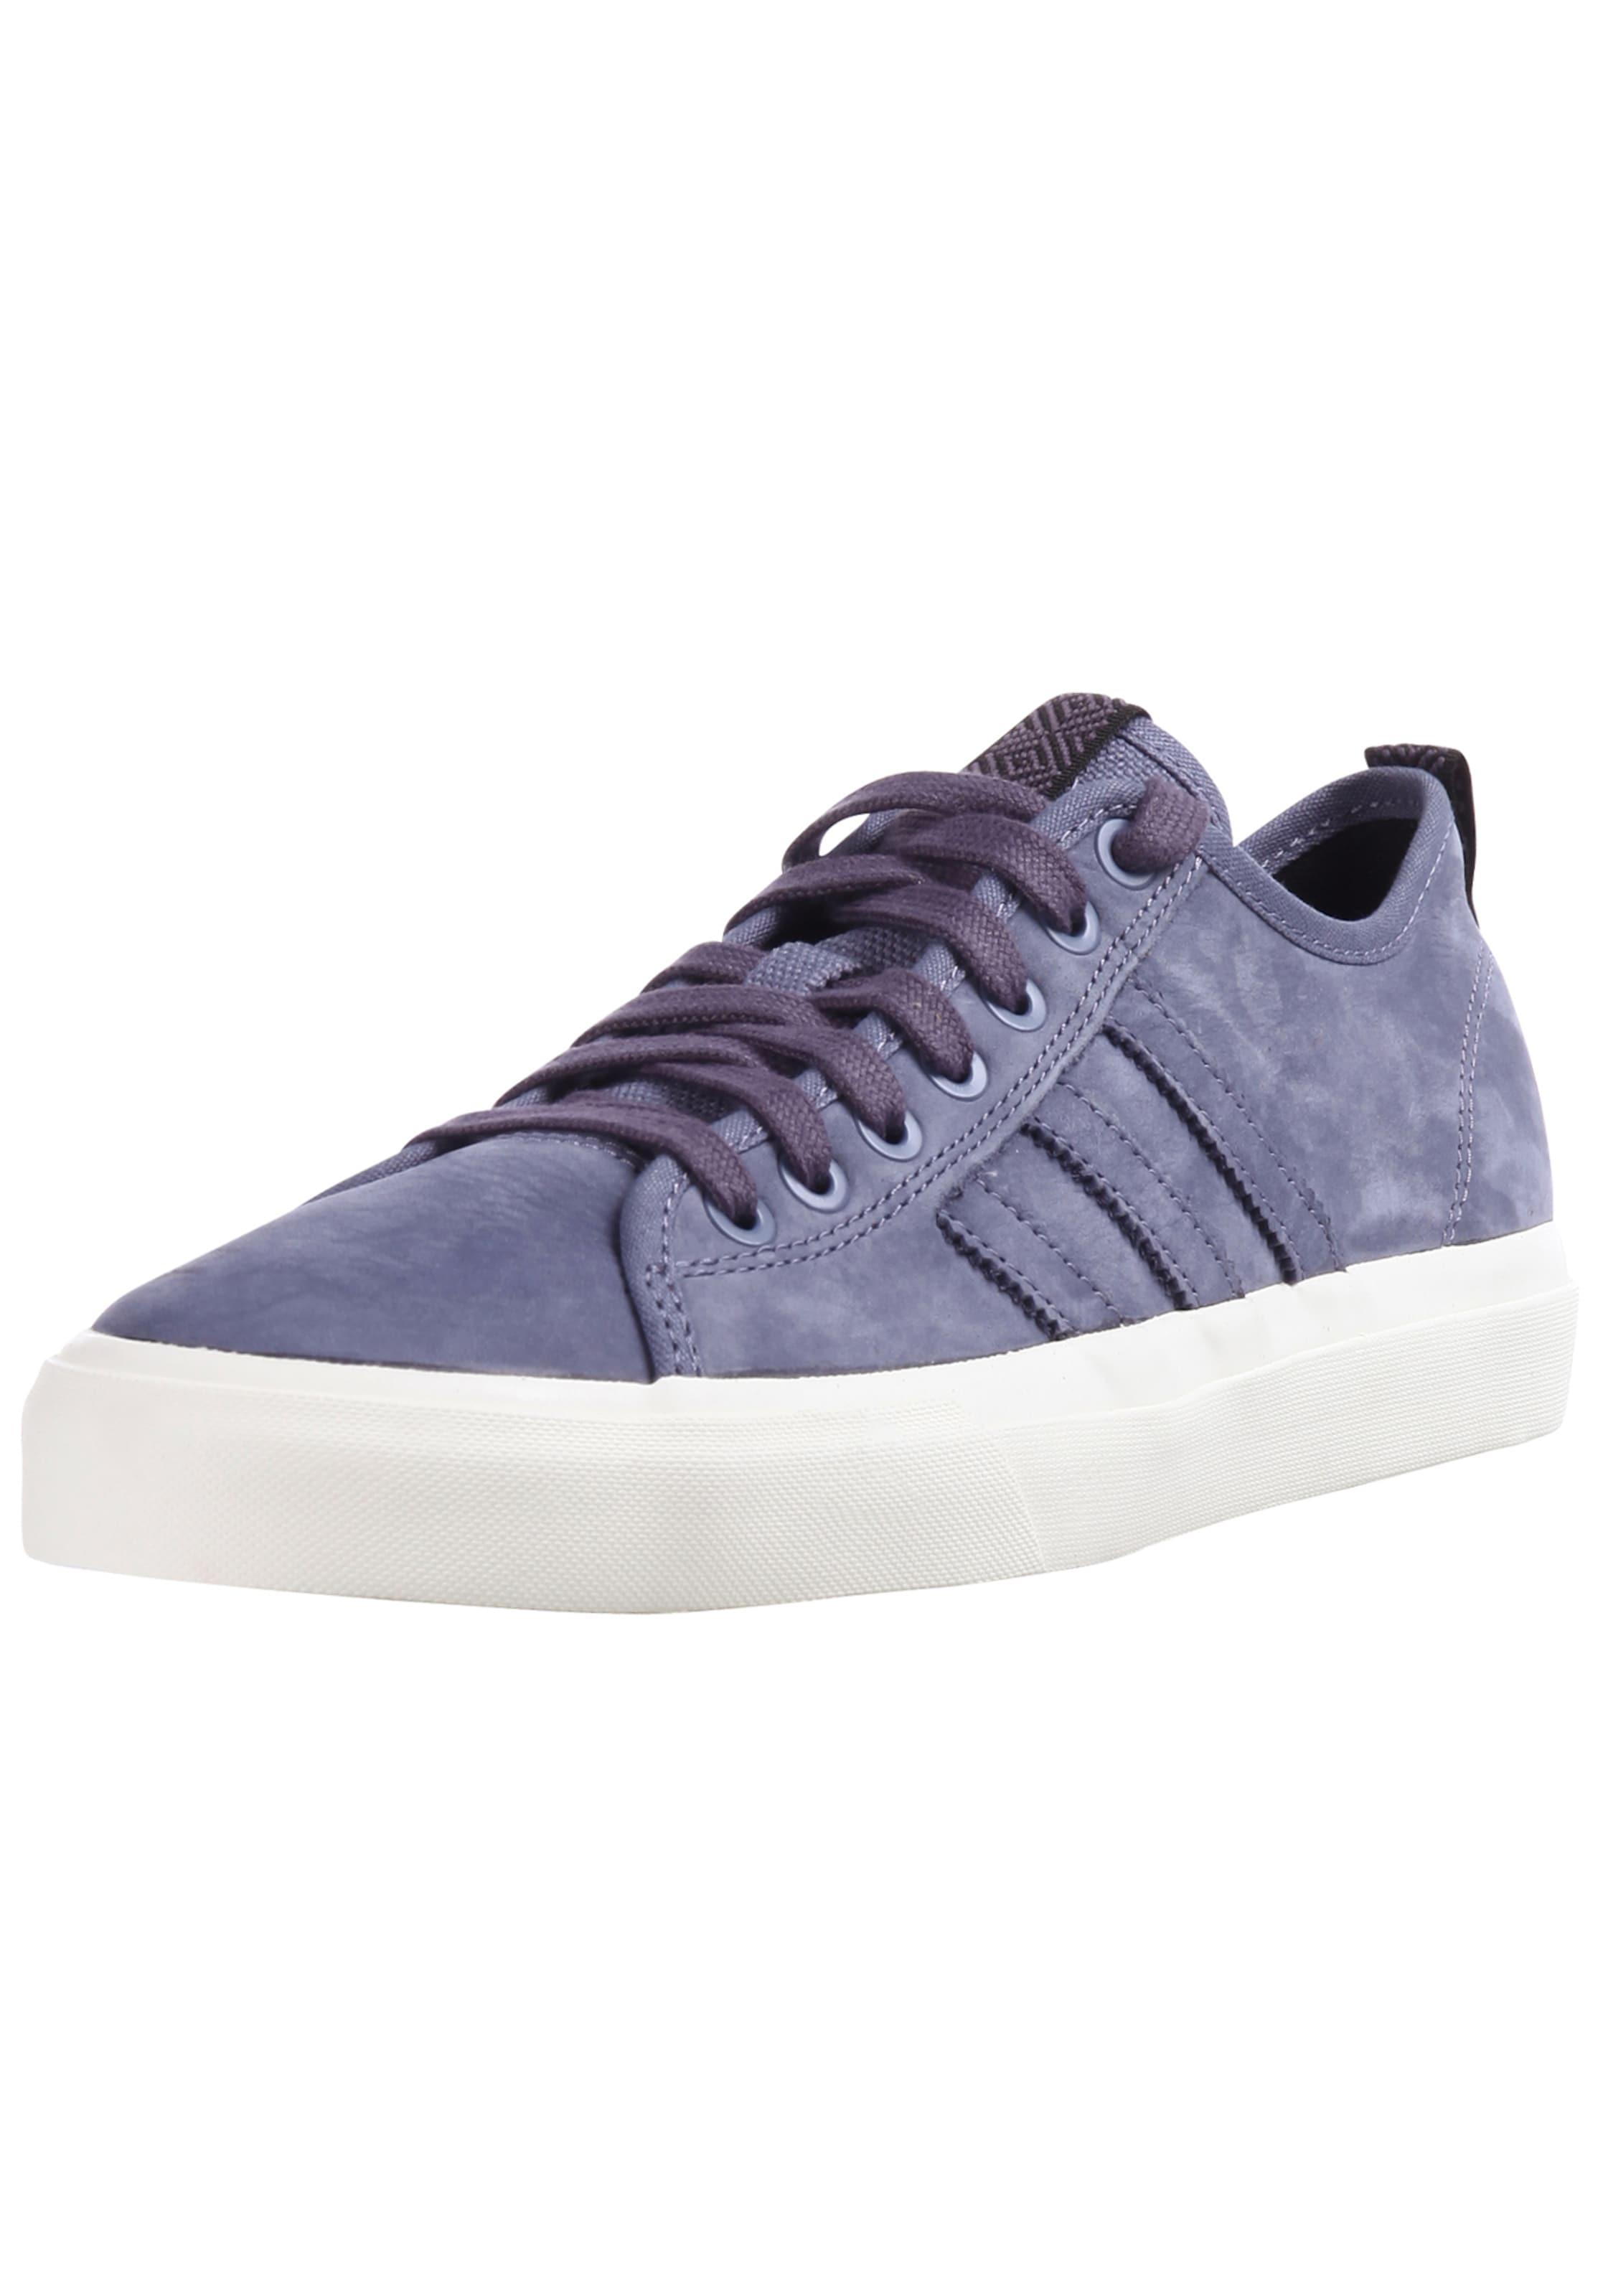 ADIDAS ORIGINALS  Matchcourt RX  Sneaker